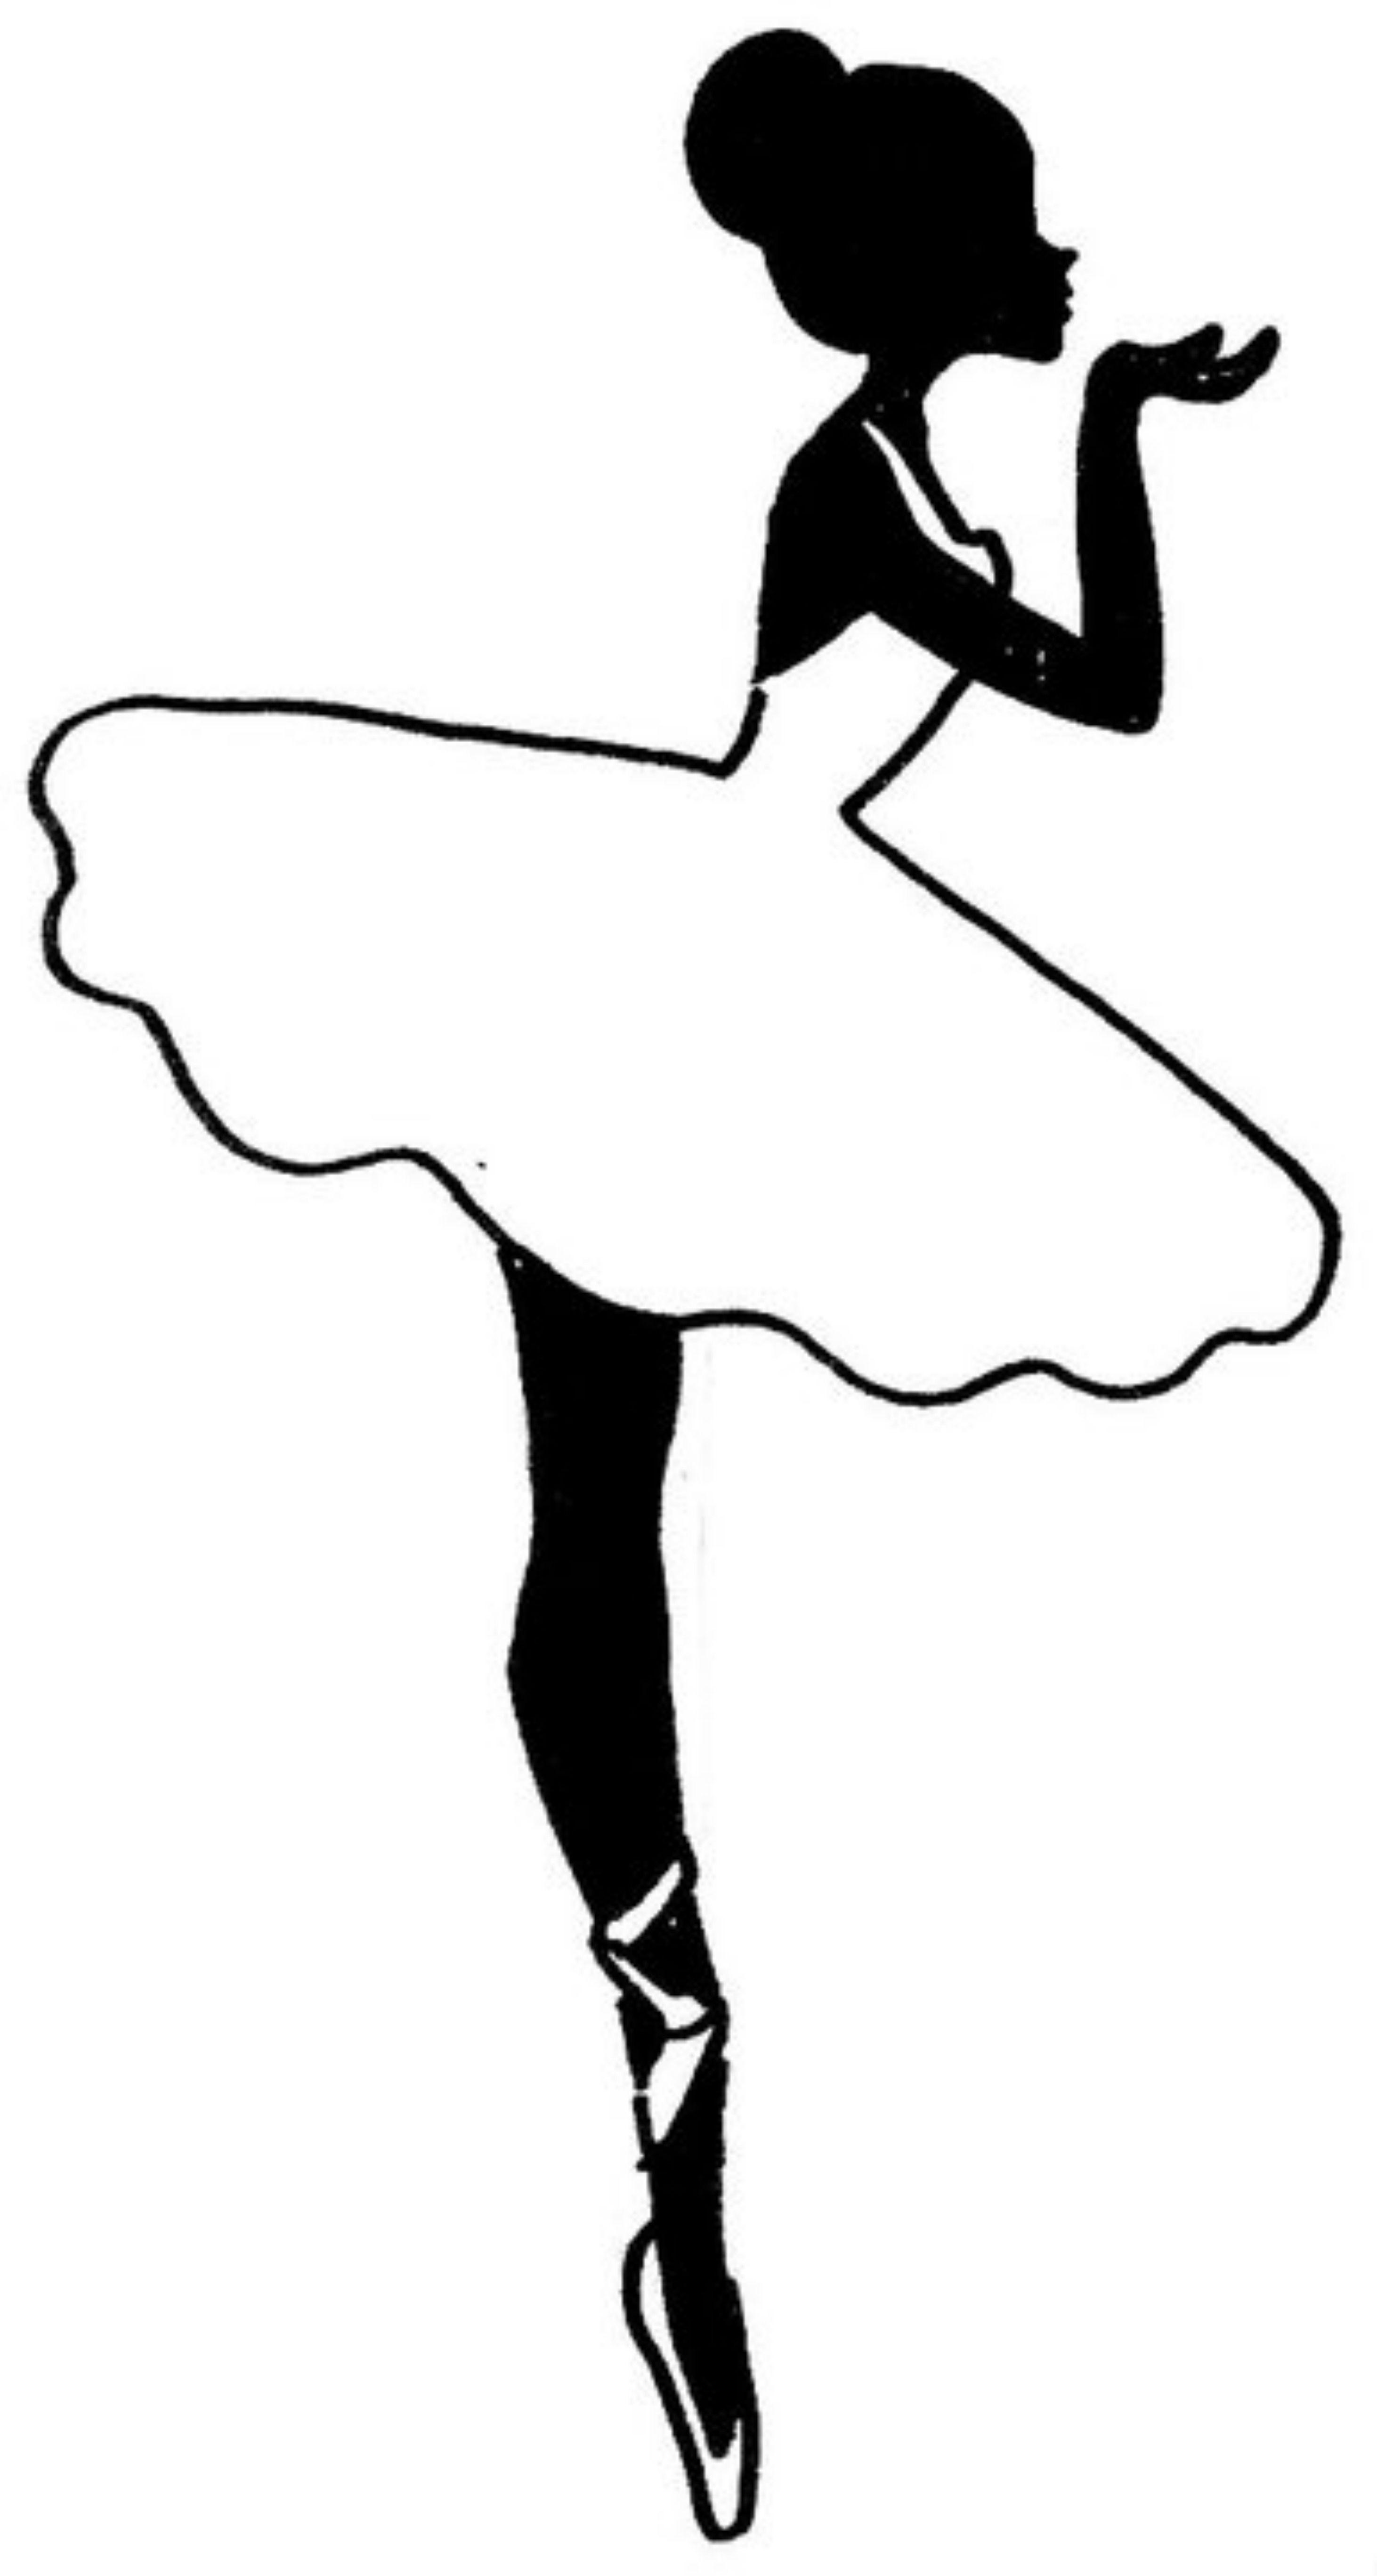 Ballerina By Dragonfly S D5ao4gr Jpg 2924 5470 Dancing Drawings Silhouette Diy Ballerina Images